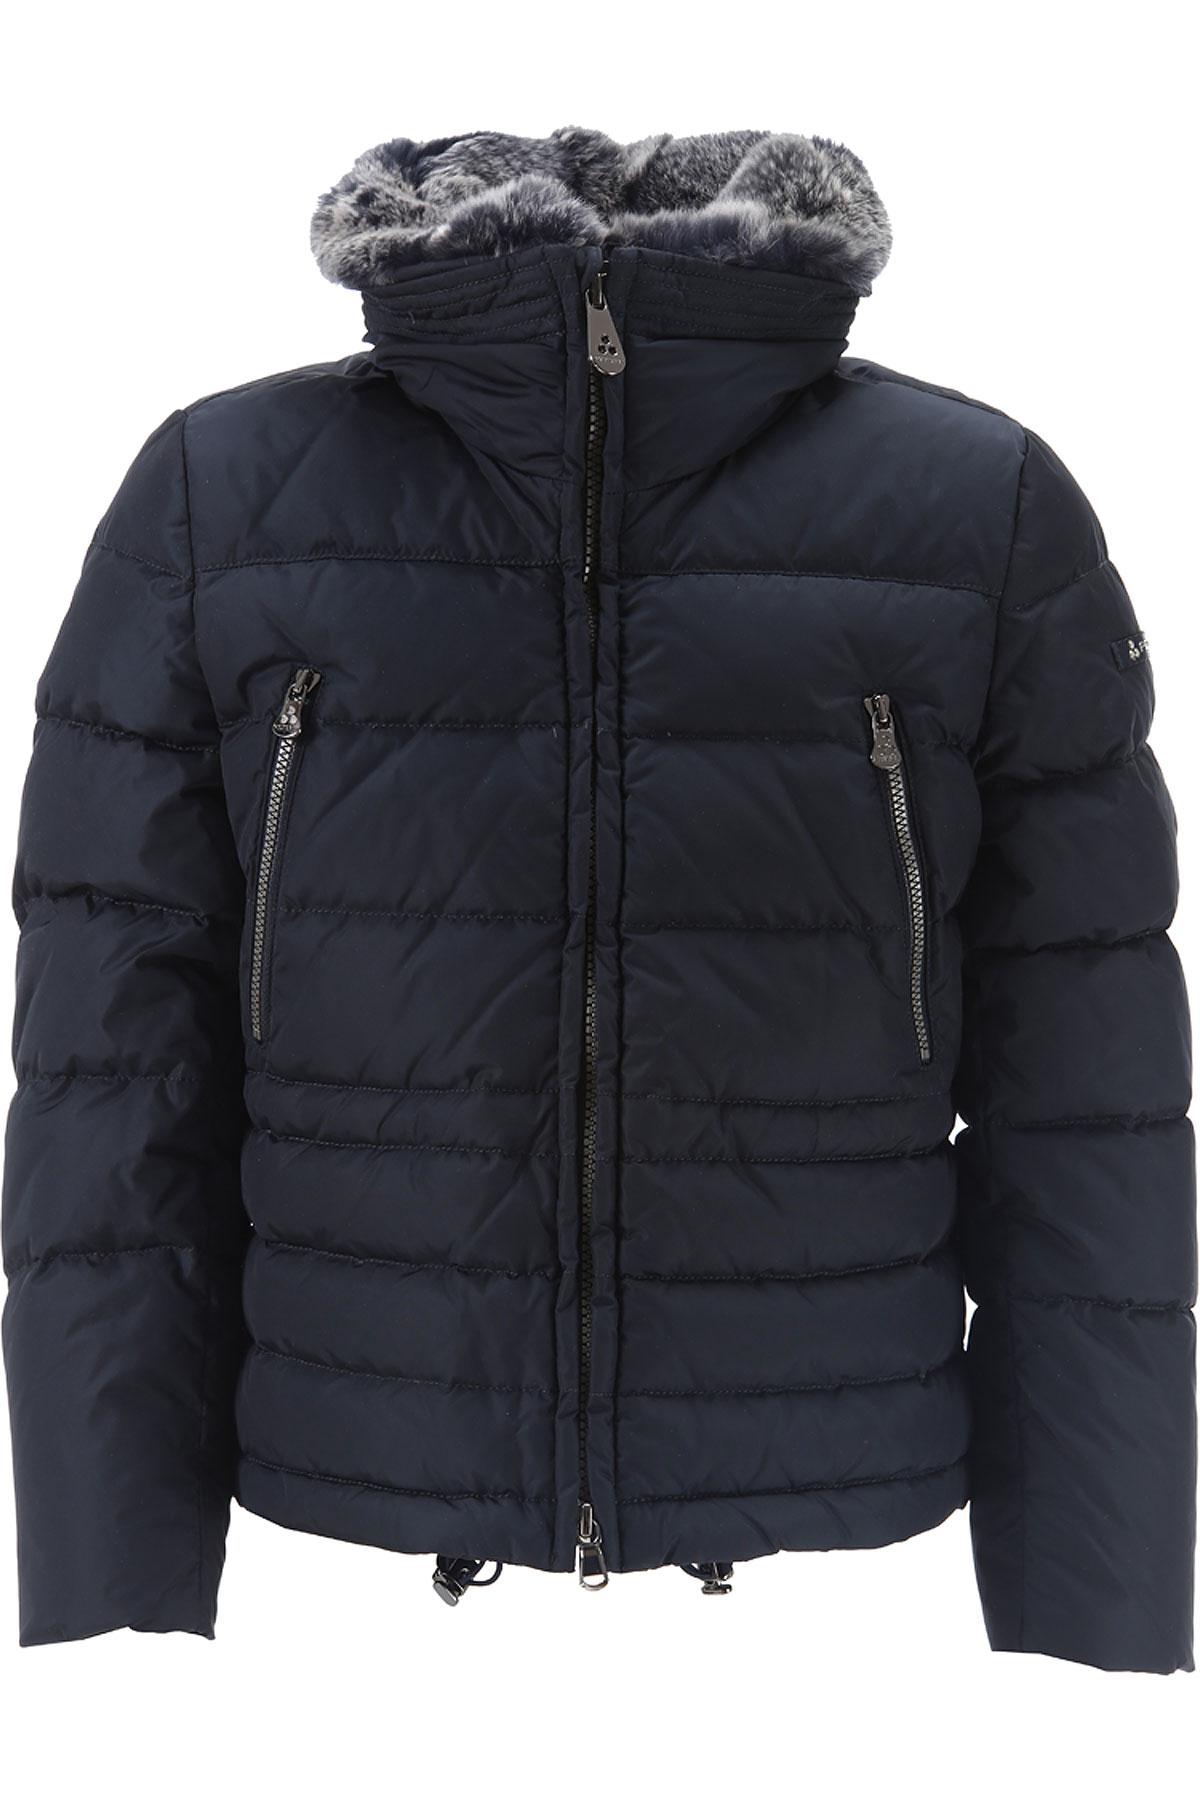 Image of Peuterey Boys Down Jacket for Kids, Puffer Ski Jacket On Sale in Outlet, Blue, polyamide, 2017